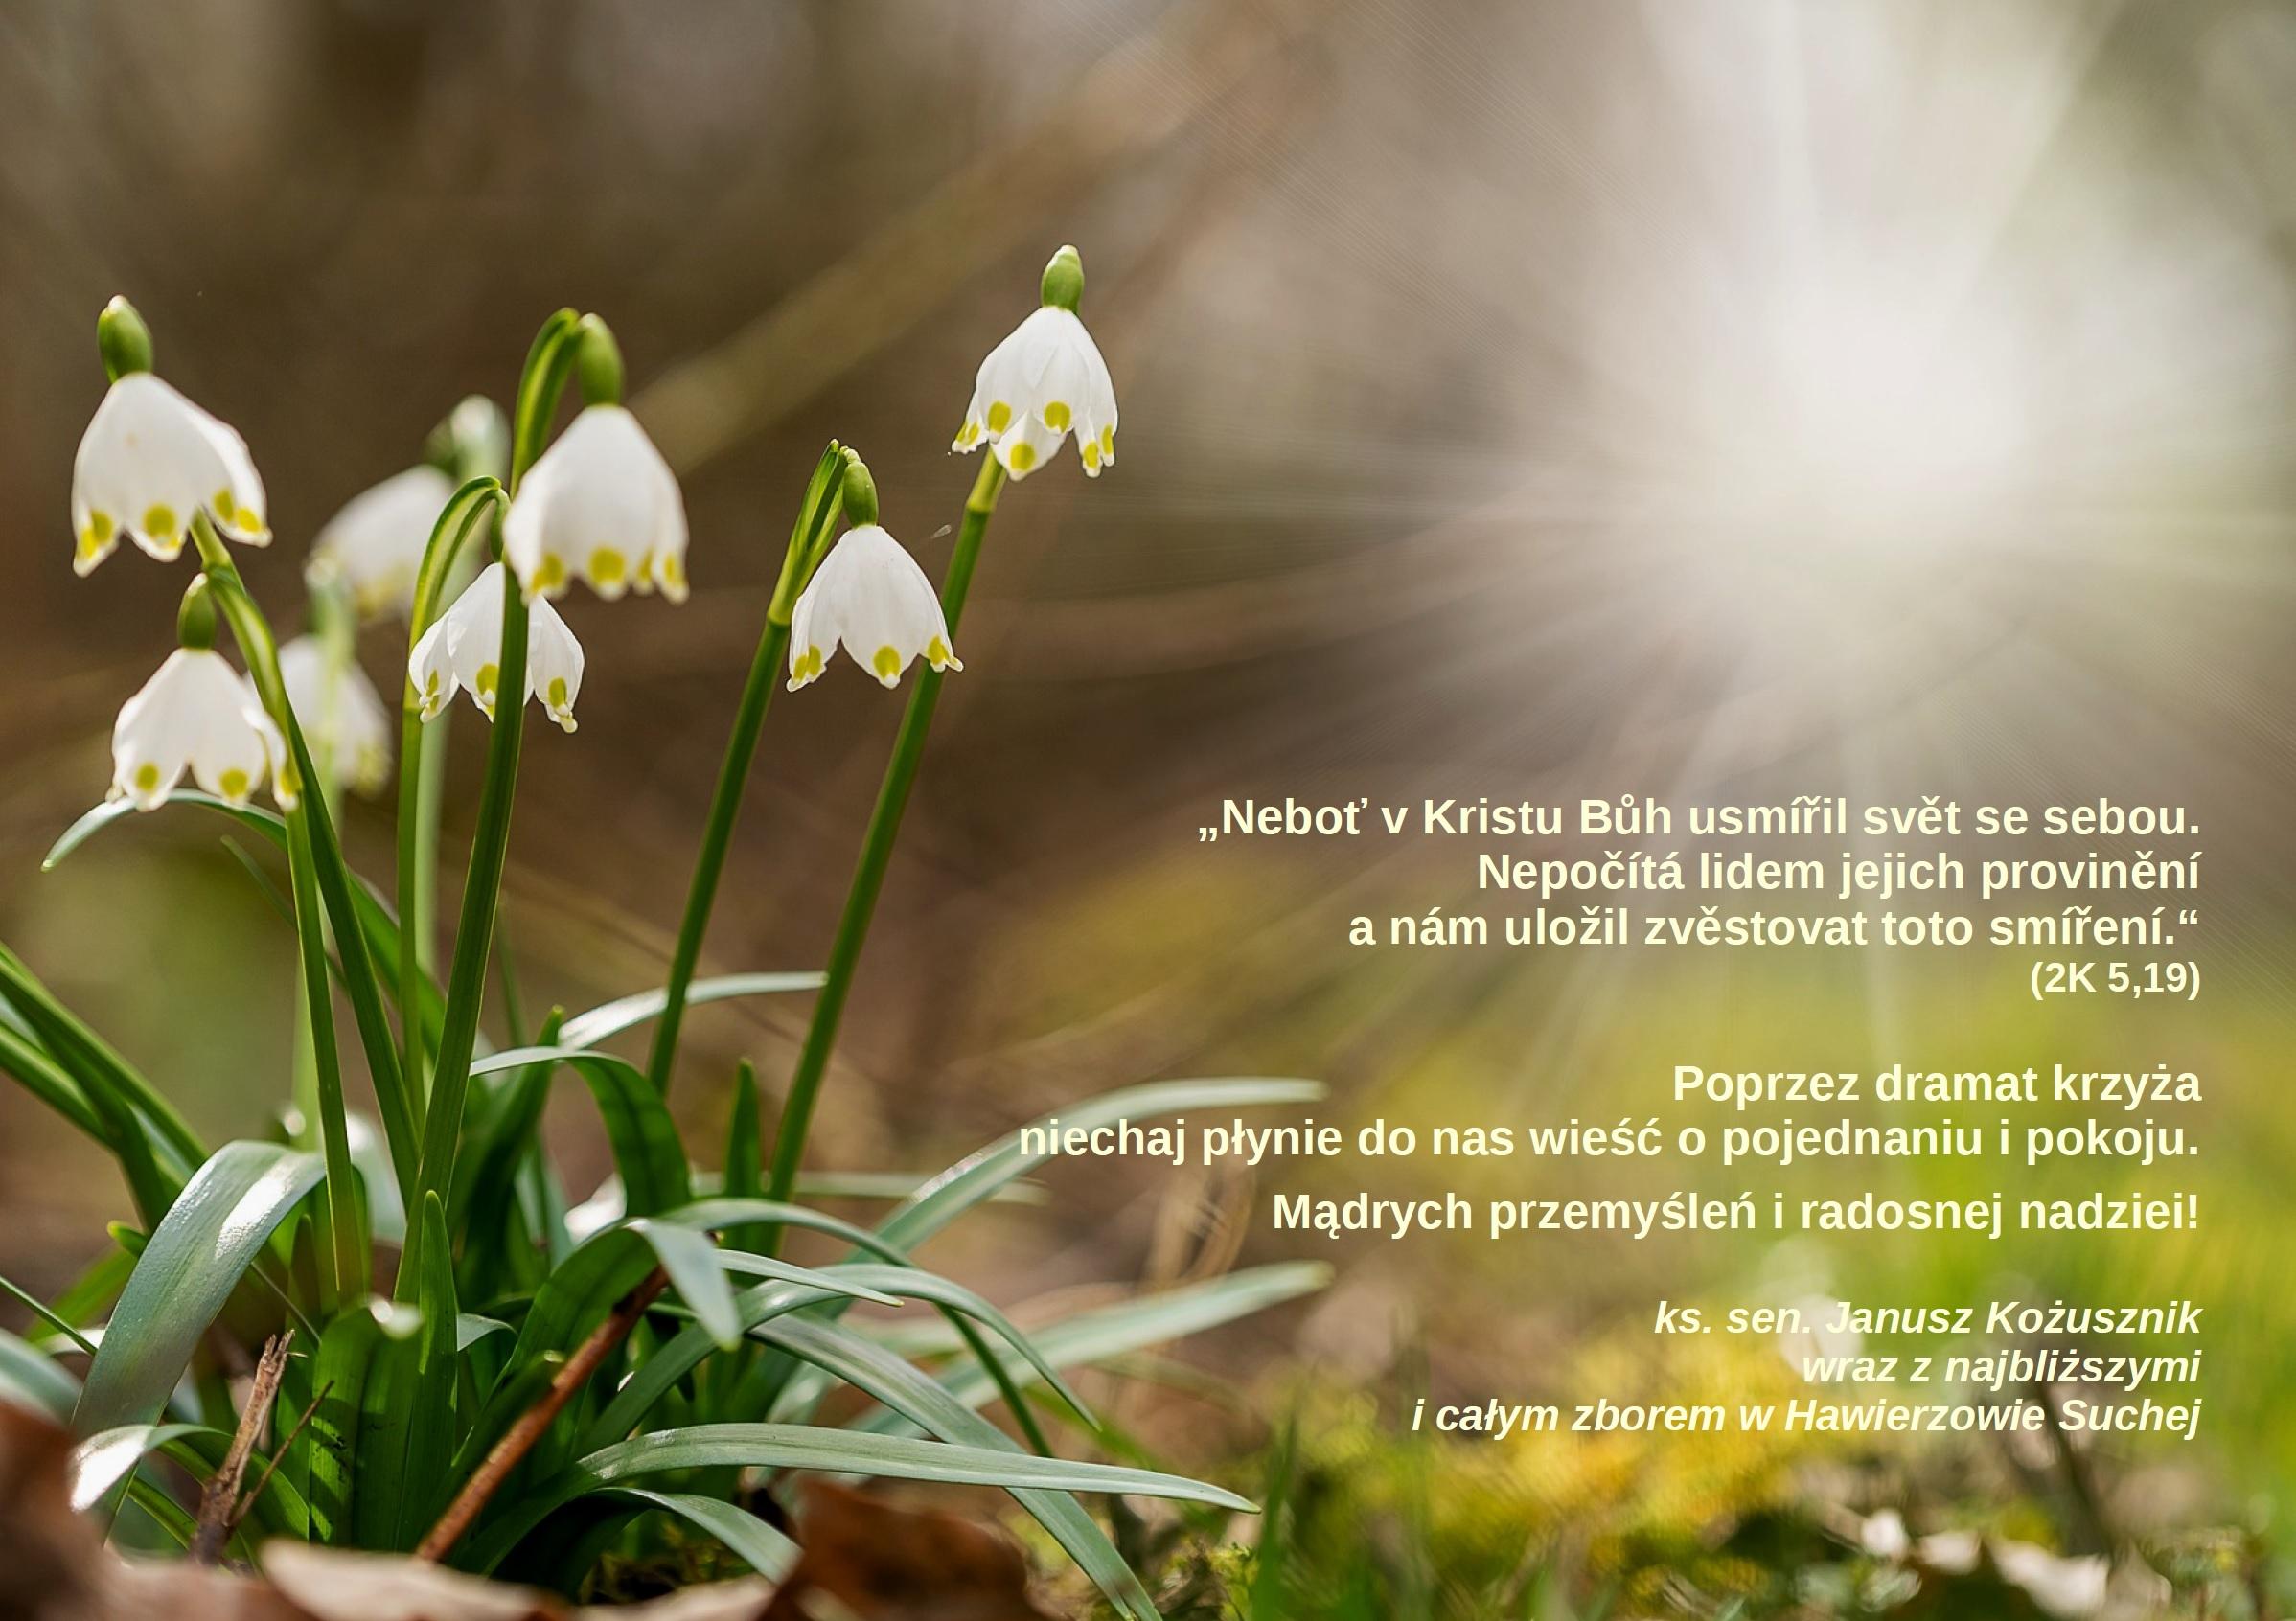 Přání na Velký týden a Velikonoce – Życzenia na Wielki Tydzień i Wielkanoc